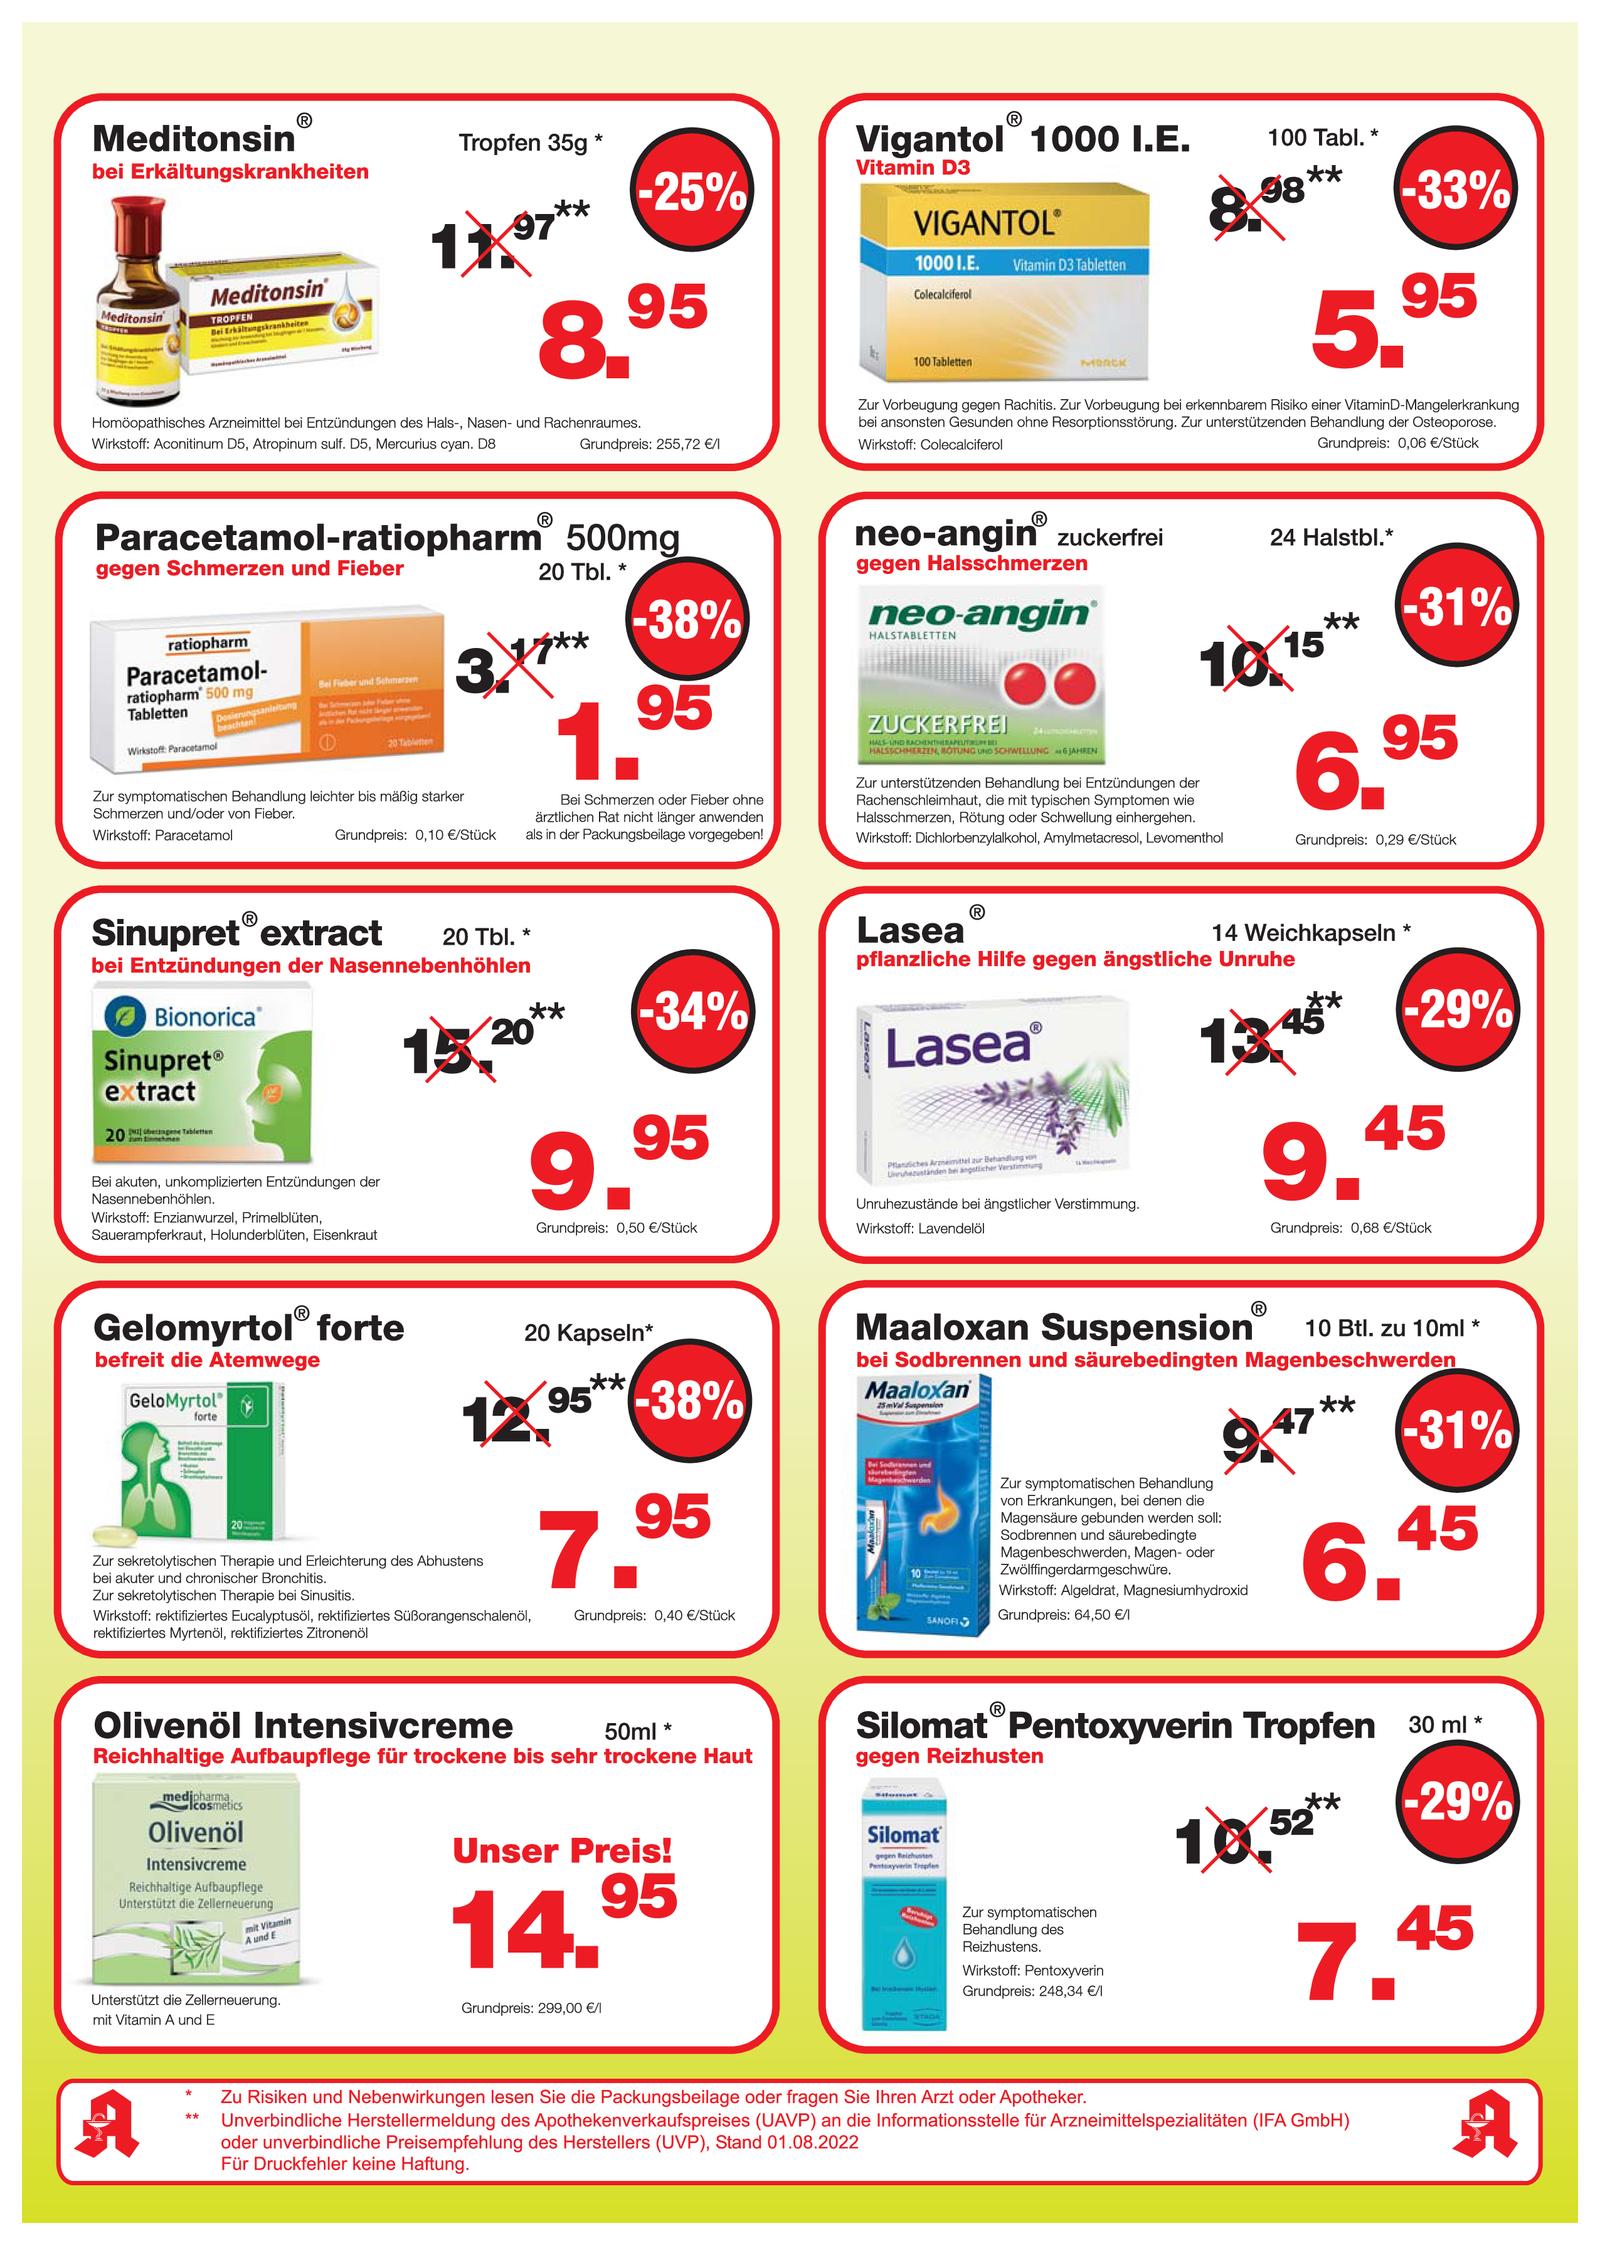 https://mein-uploads.apocdn.net/13790/leaflets/13790_flyer-Seite2.png